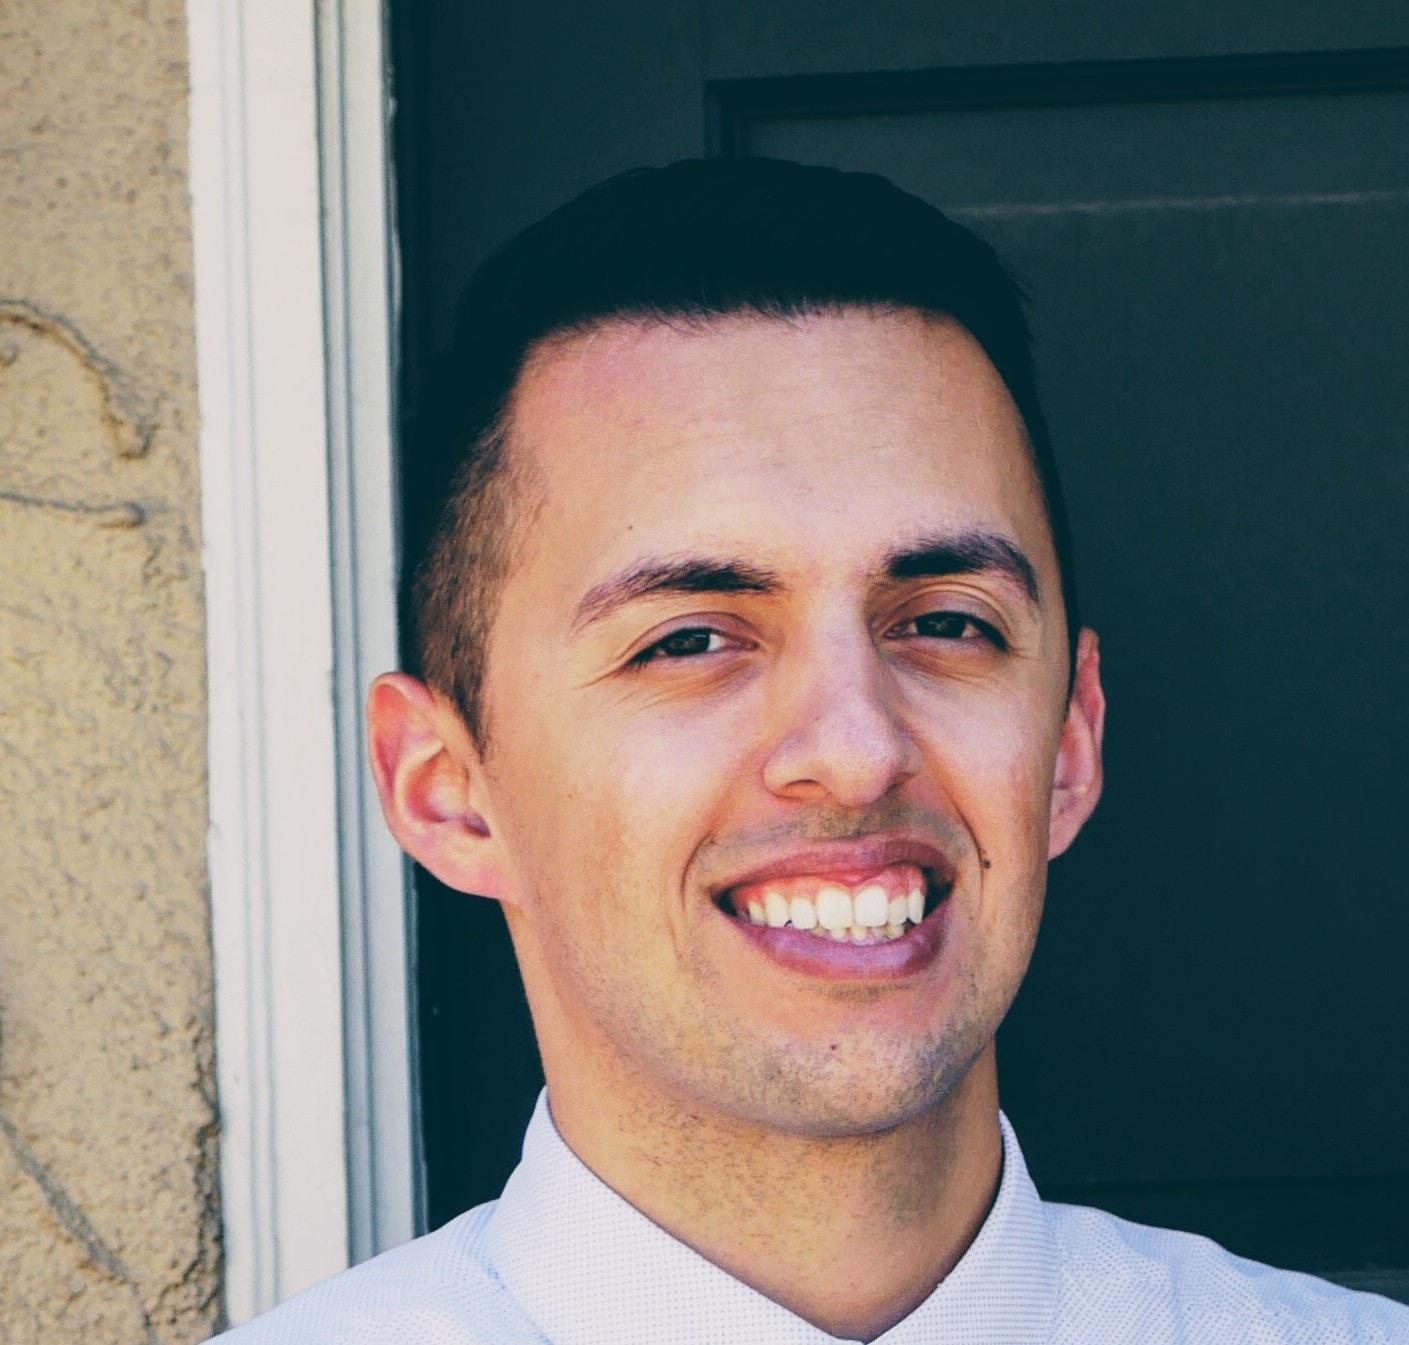 Go to Ryan Sepulveda's profile